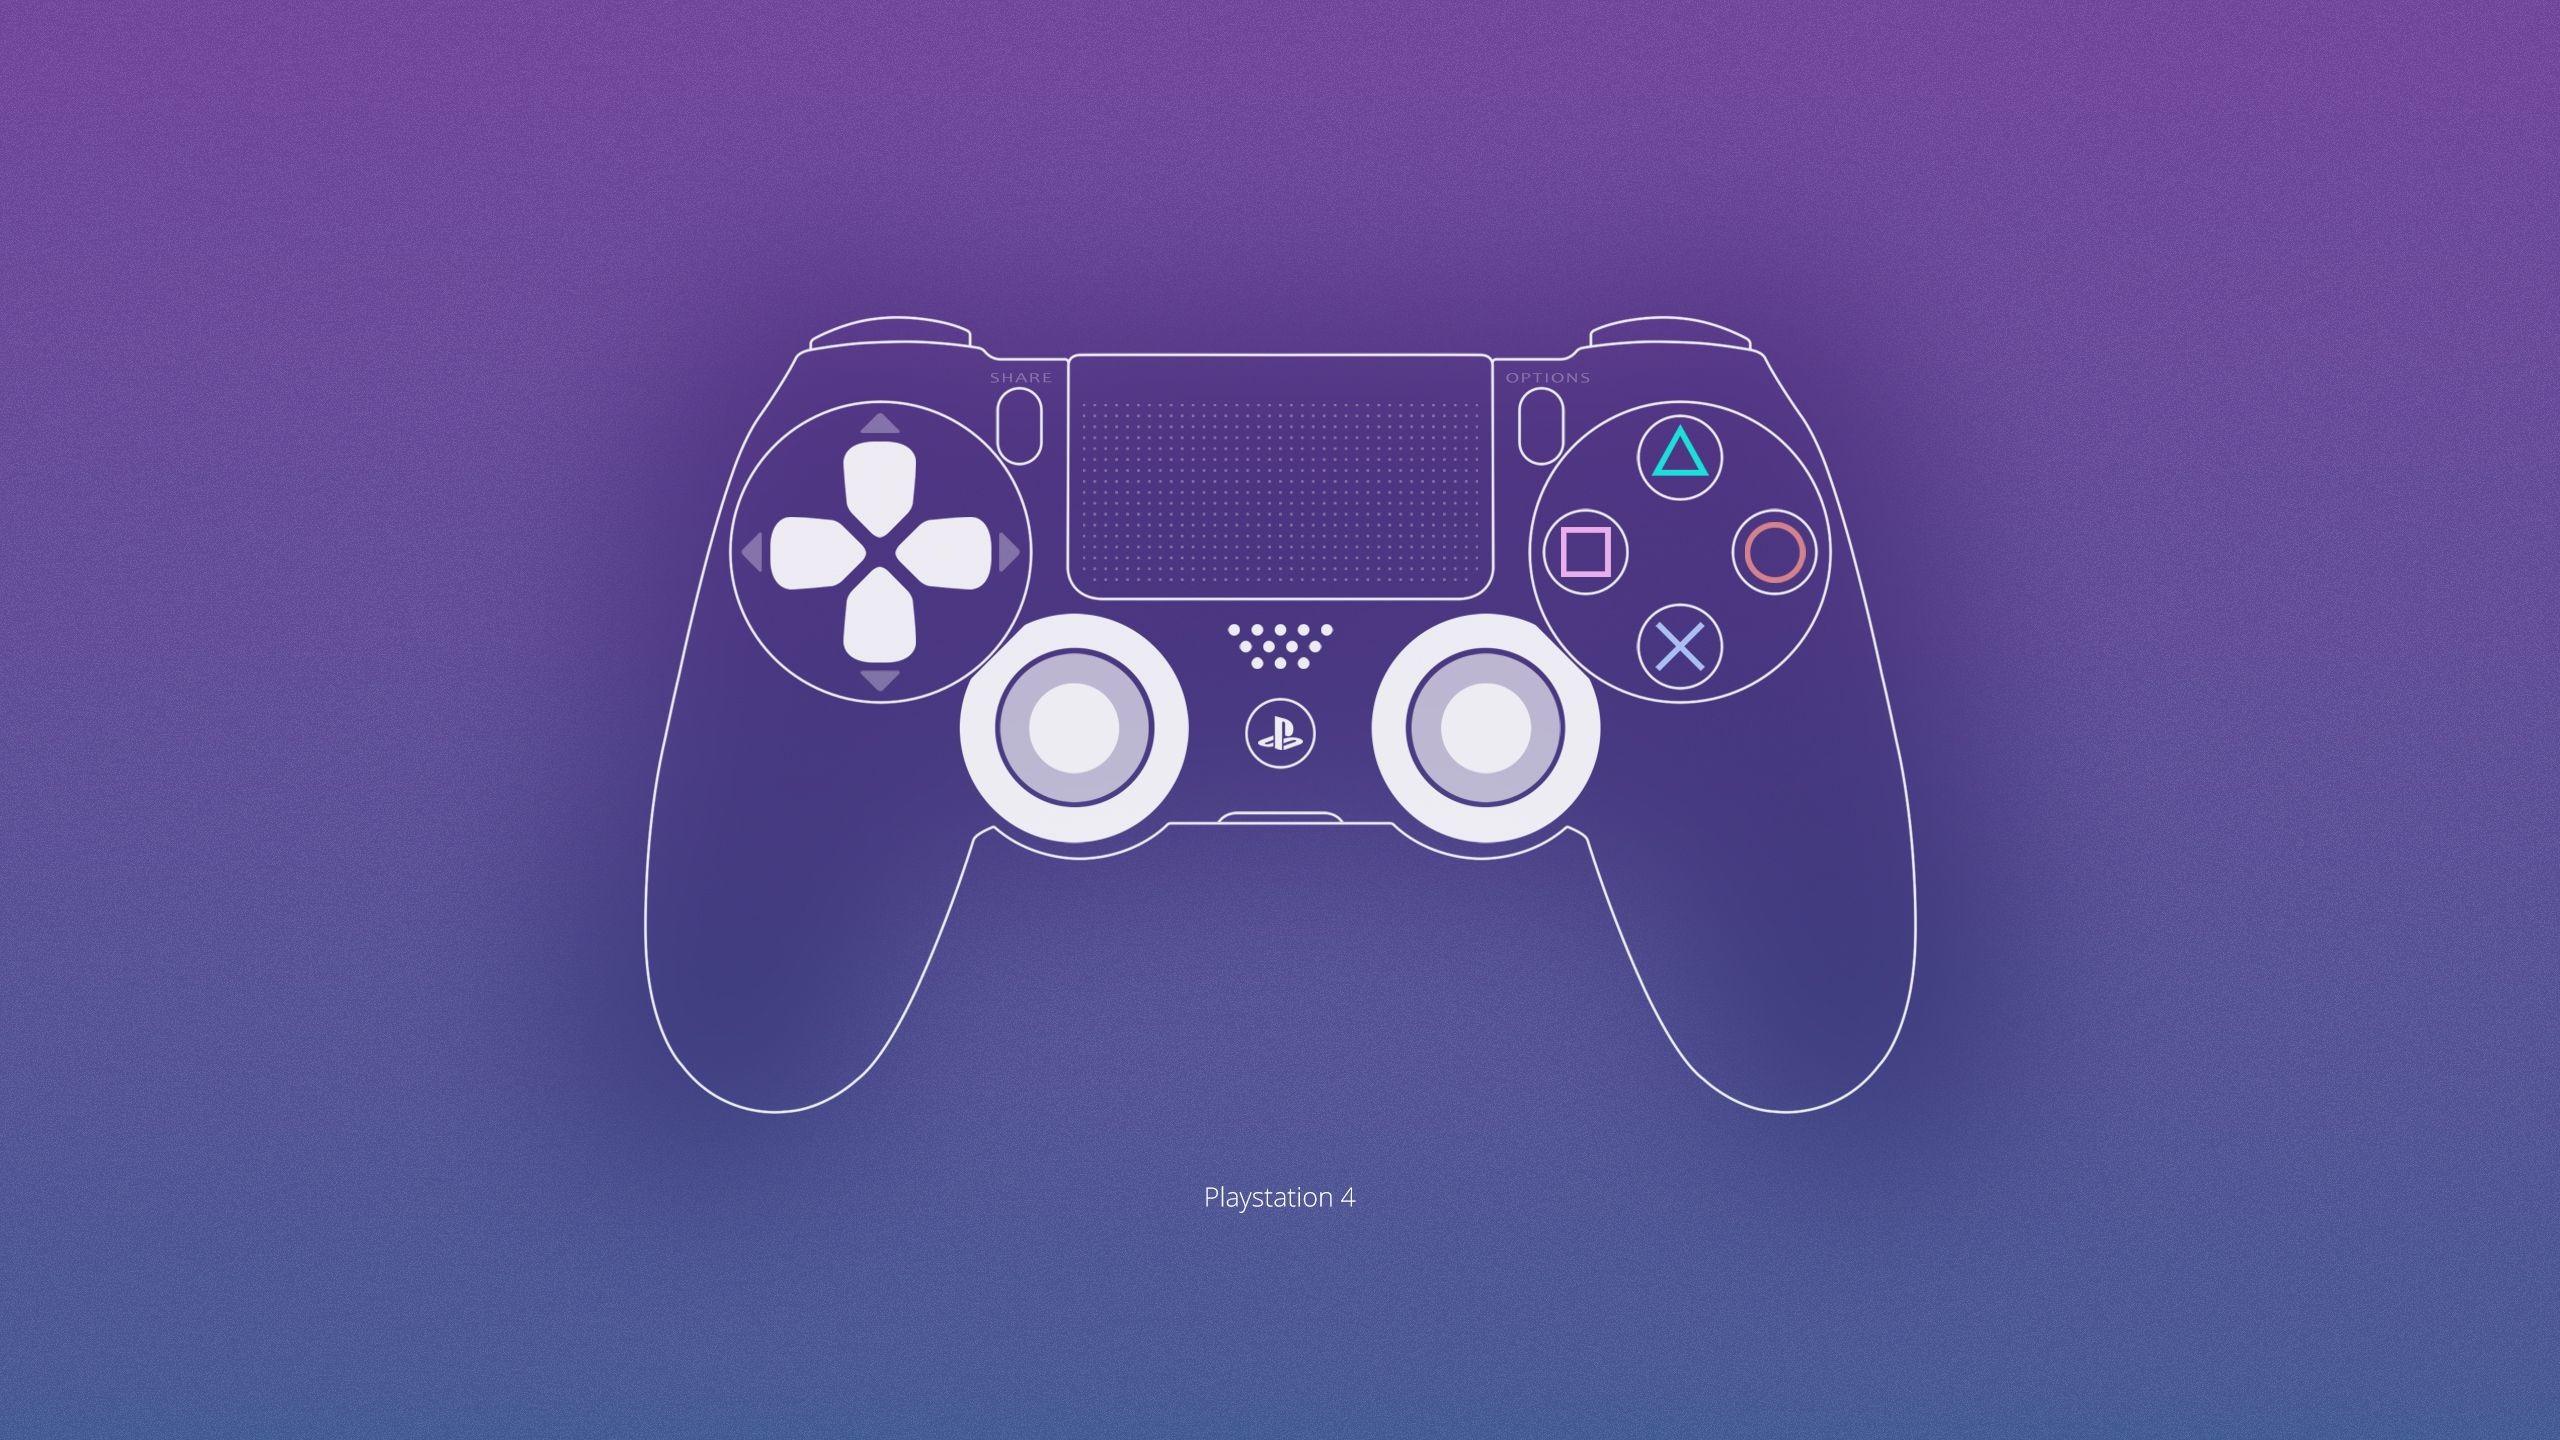 Playstation 4 Wallpaper by ljdesigner on DeviantArt